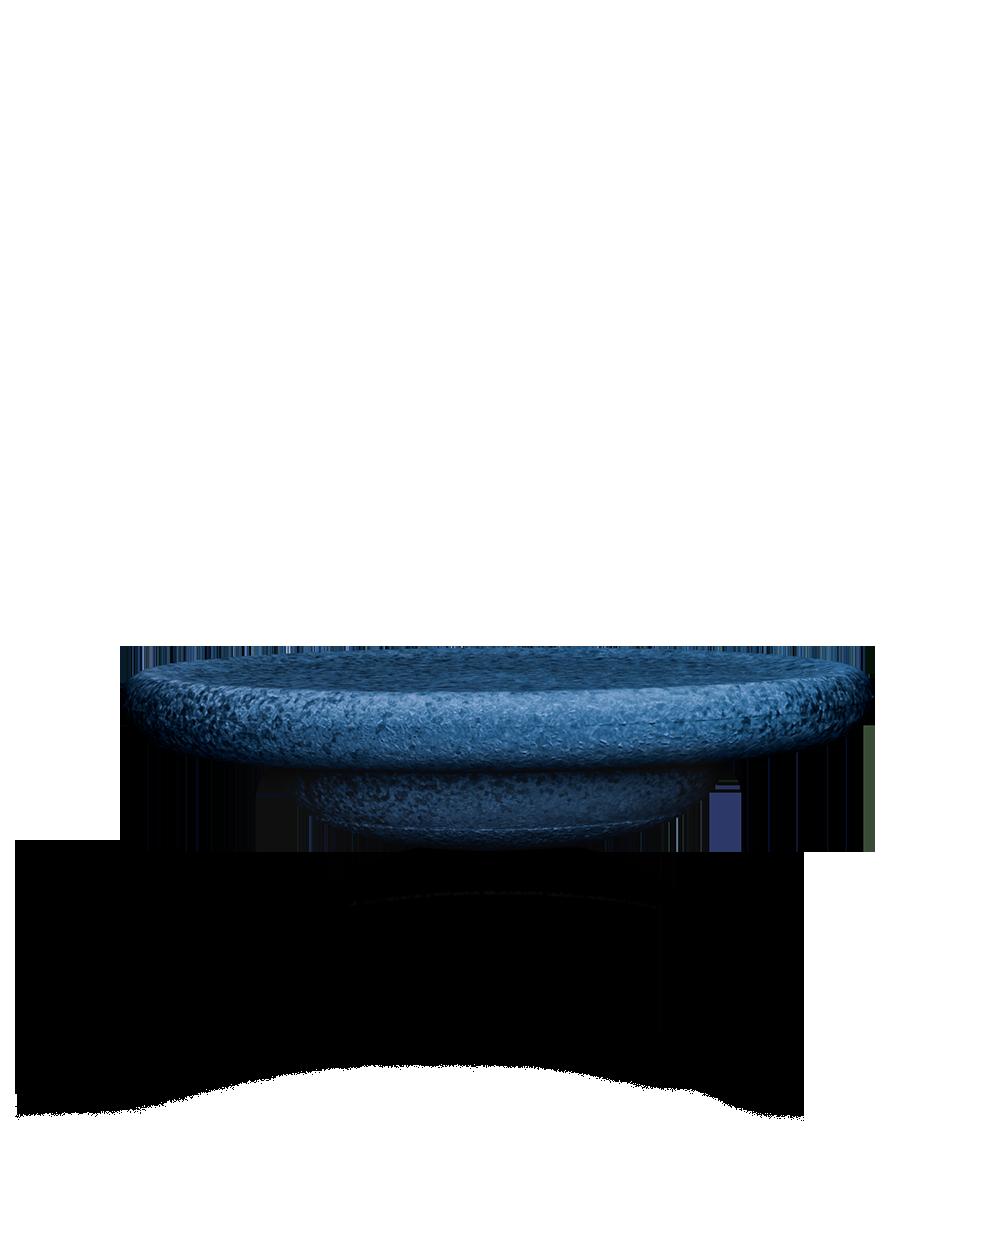 stapelstein-balance-board-single-nightblue